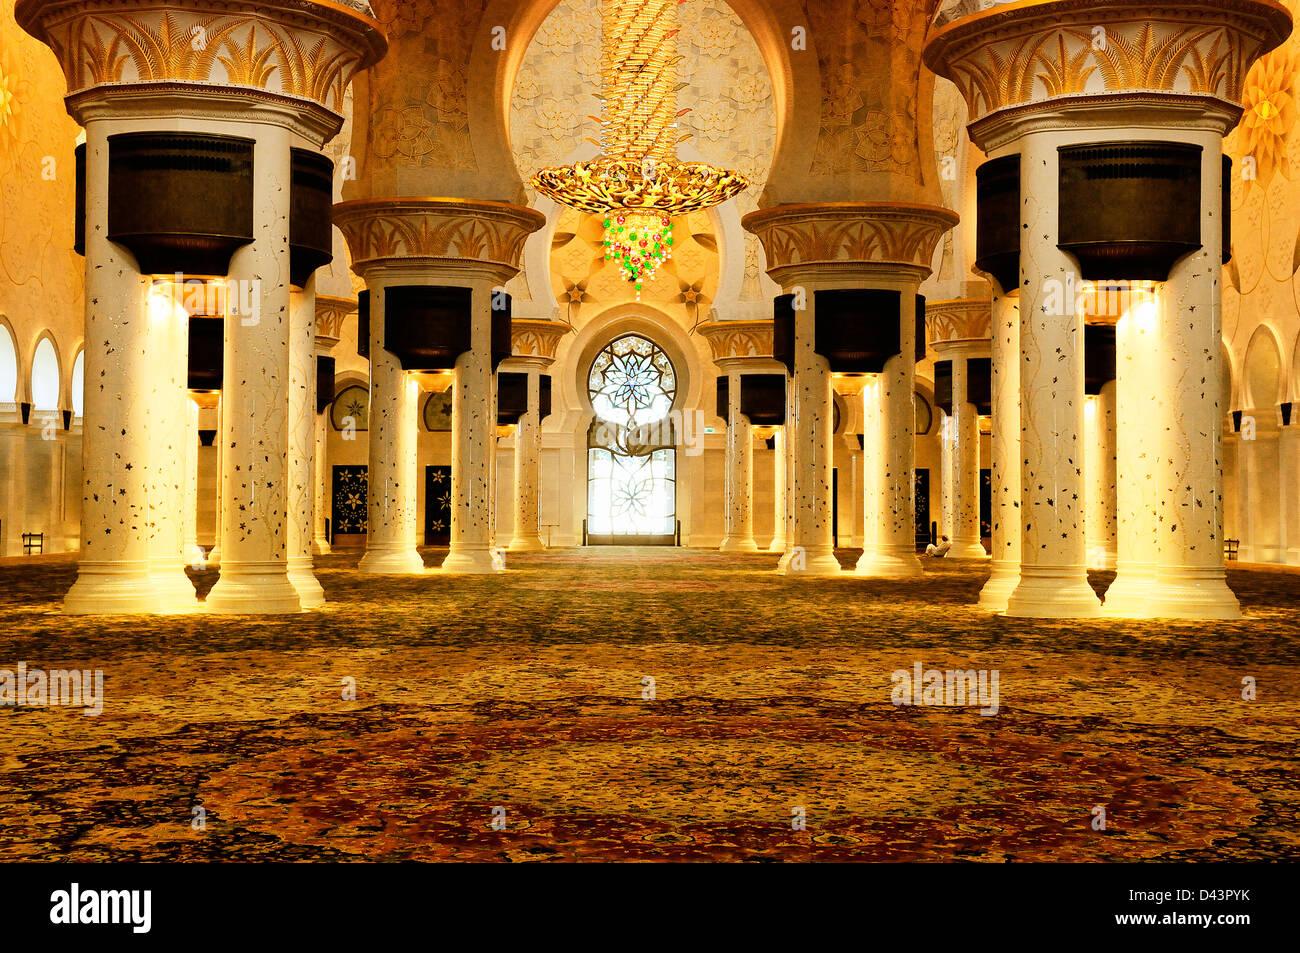 Splendido lampadario all'interno di Sheikh Zayed moschea, Abu Dhabi, Emirati arabi uniti Immagini Stock